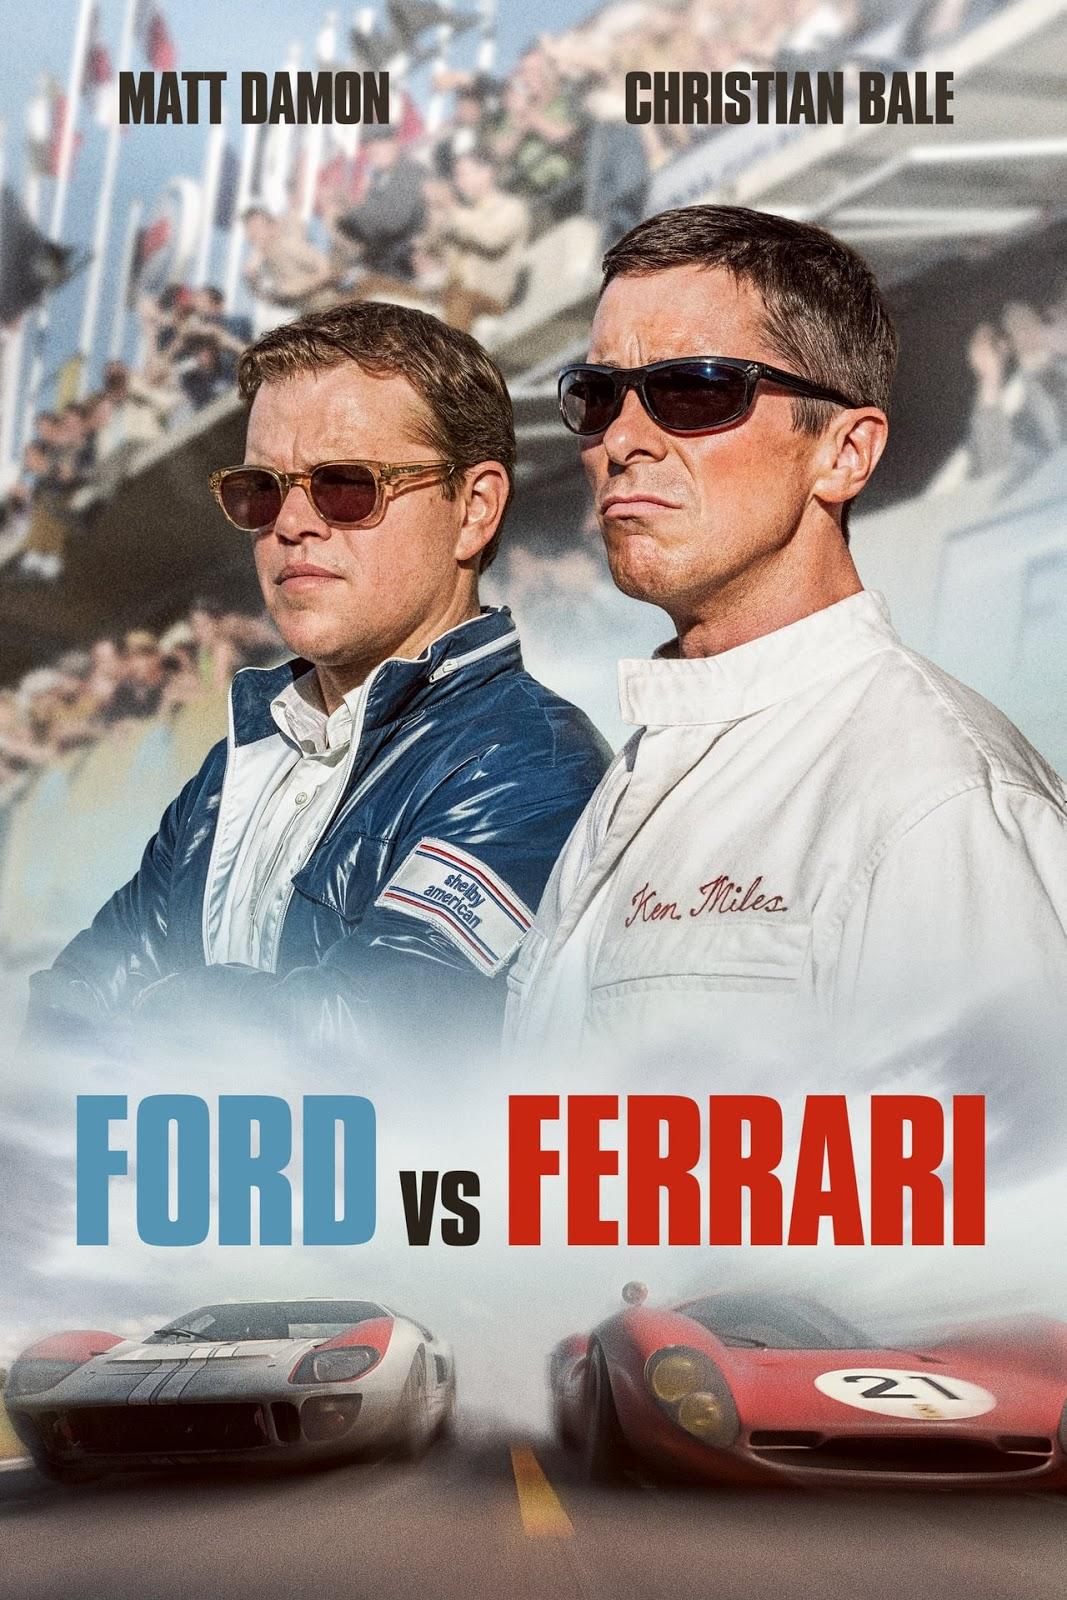 Download Full Movie Ford vs Ferrari 2019